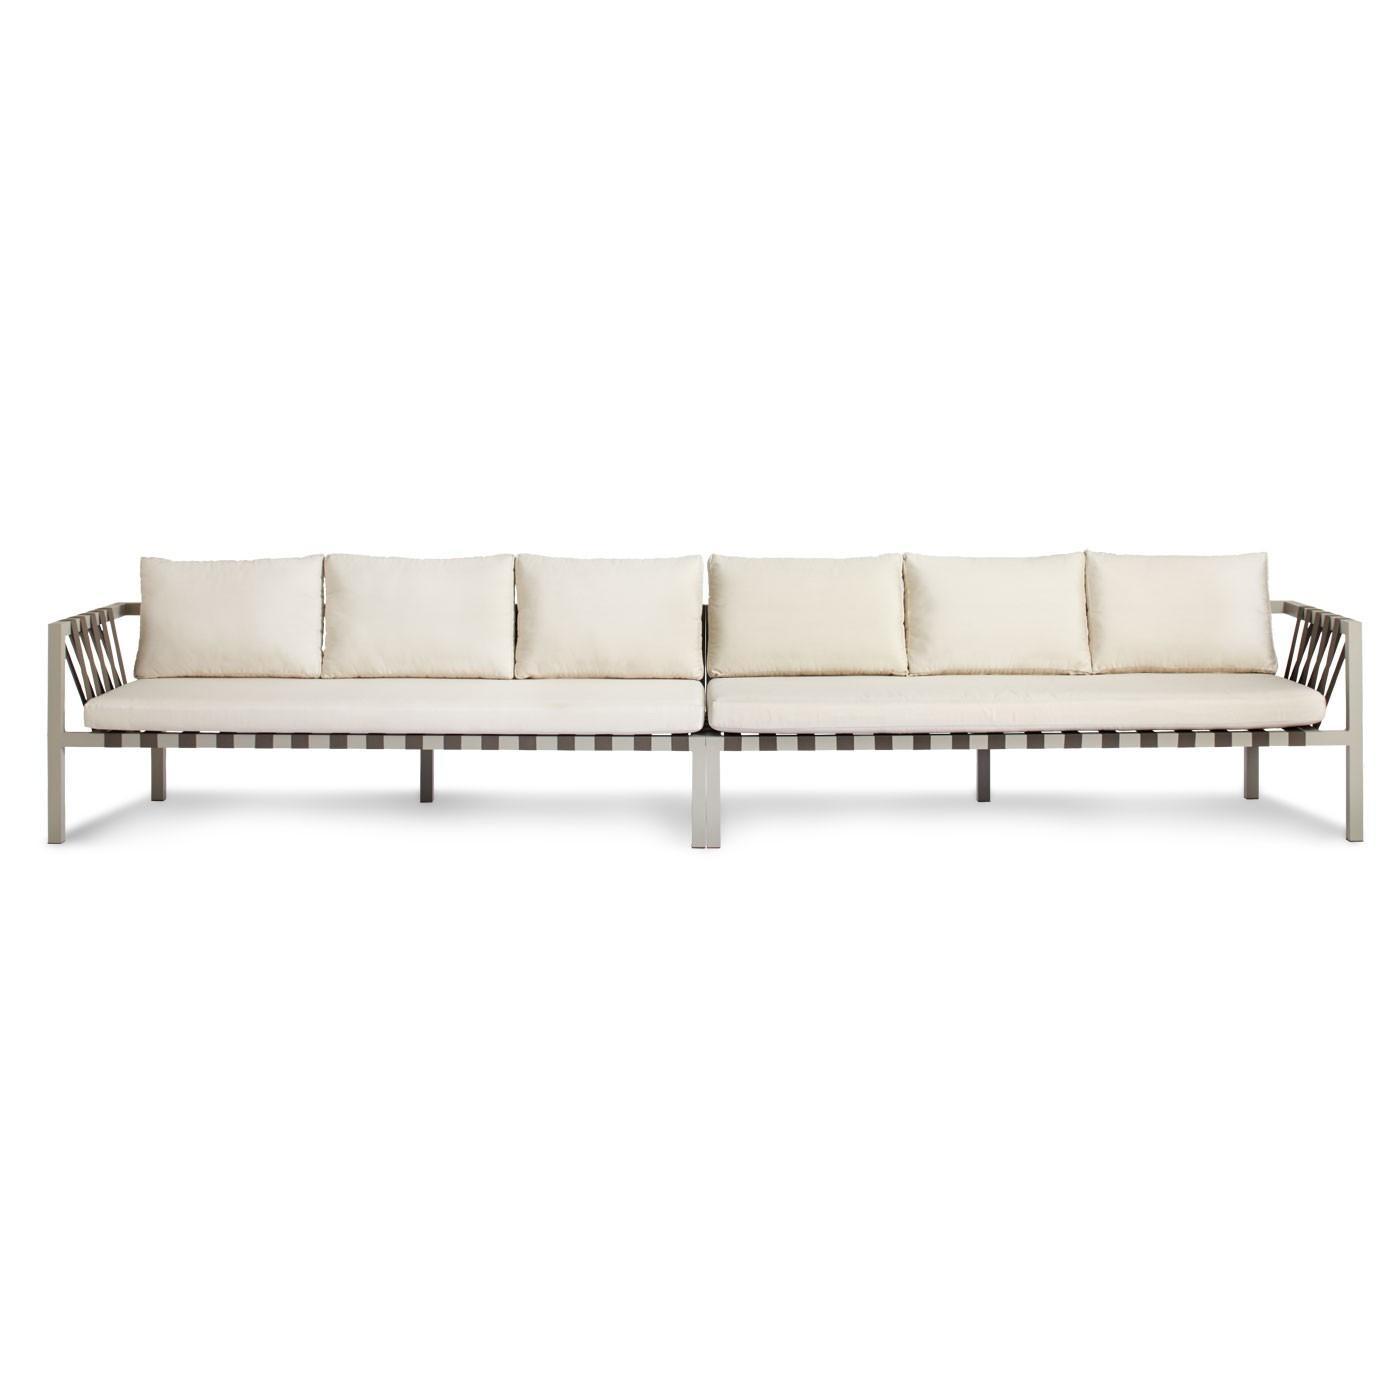 Jibe Outdoor Extra Long Sectional Sofa - Modern Furniture - Blu Dot inside Long Modern Sofas